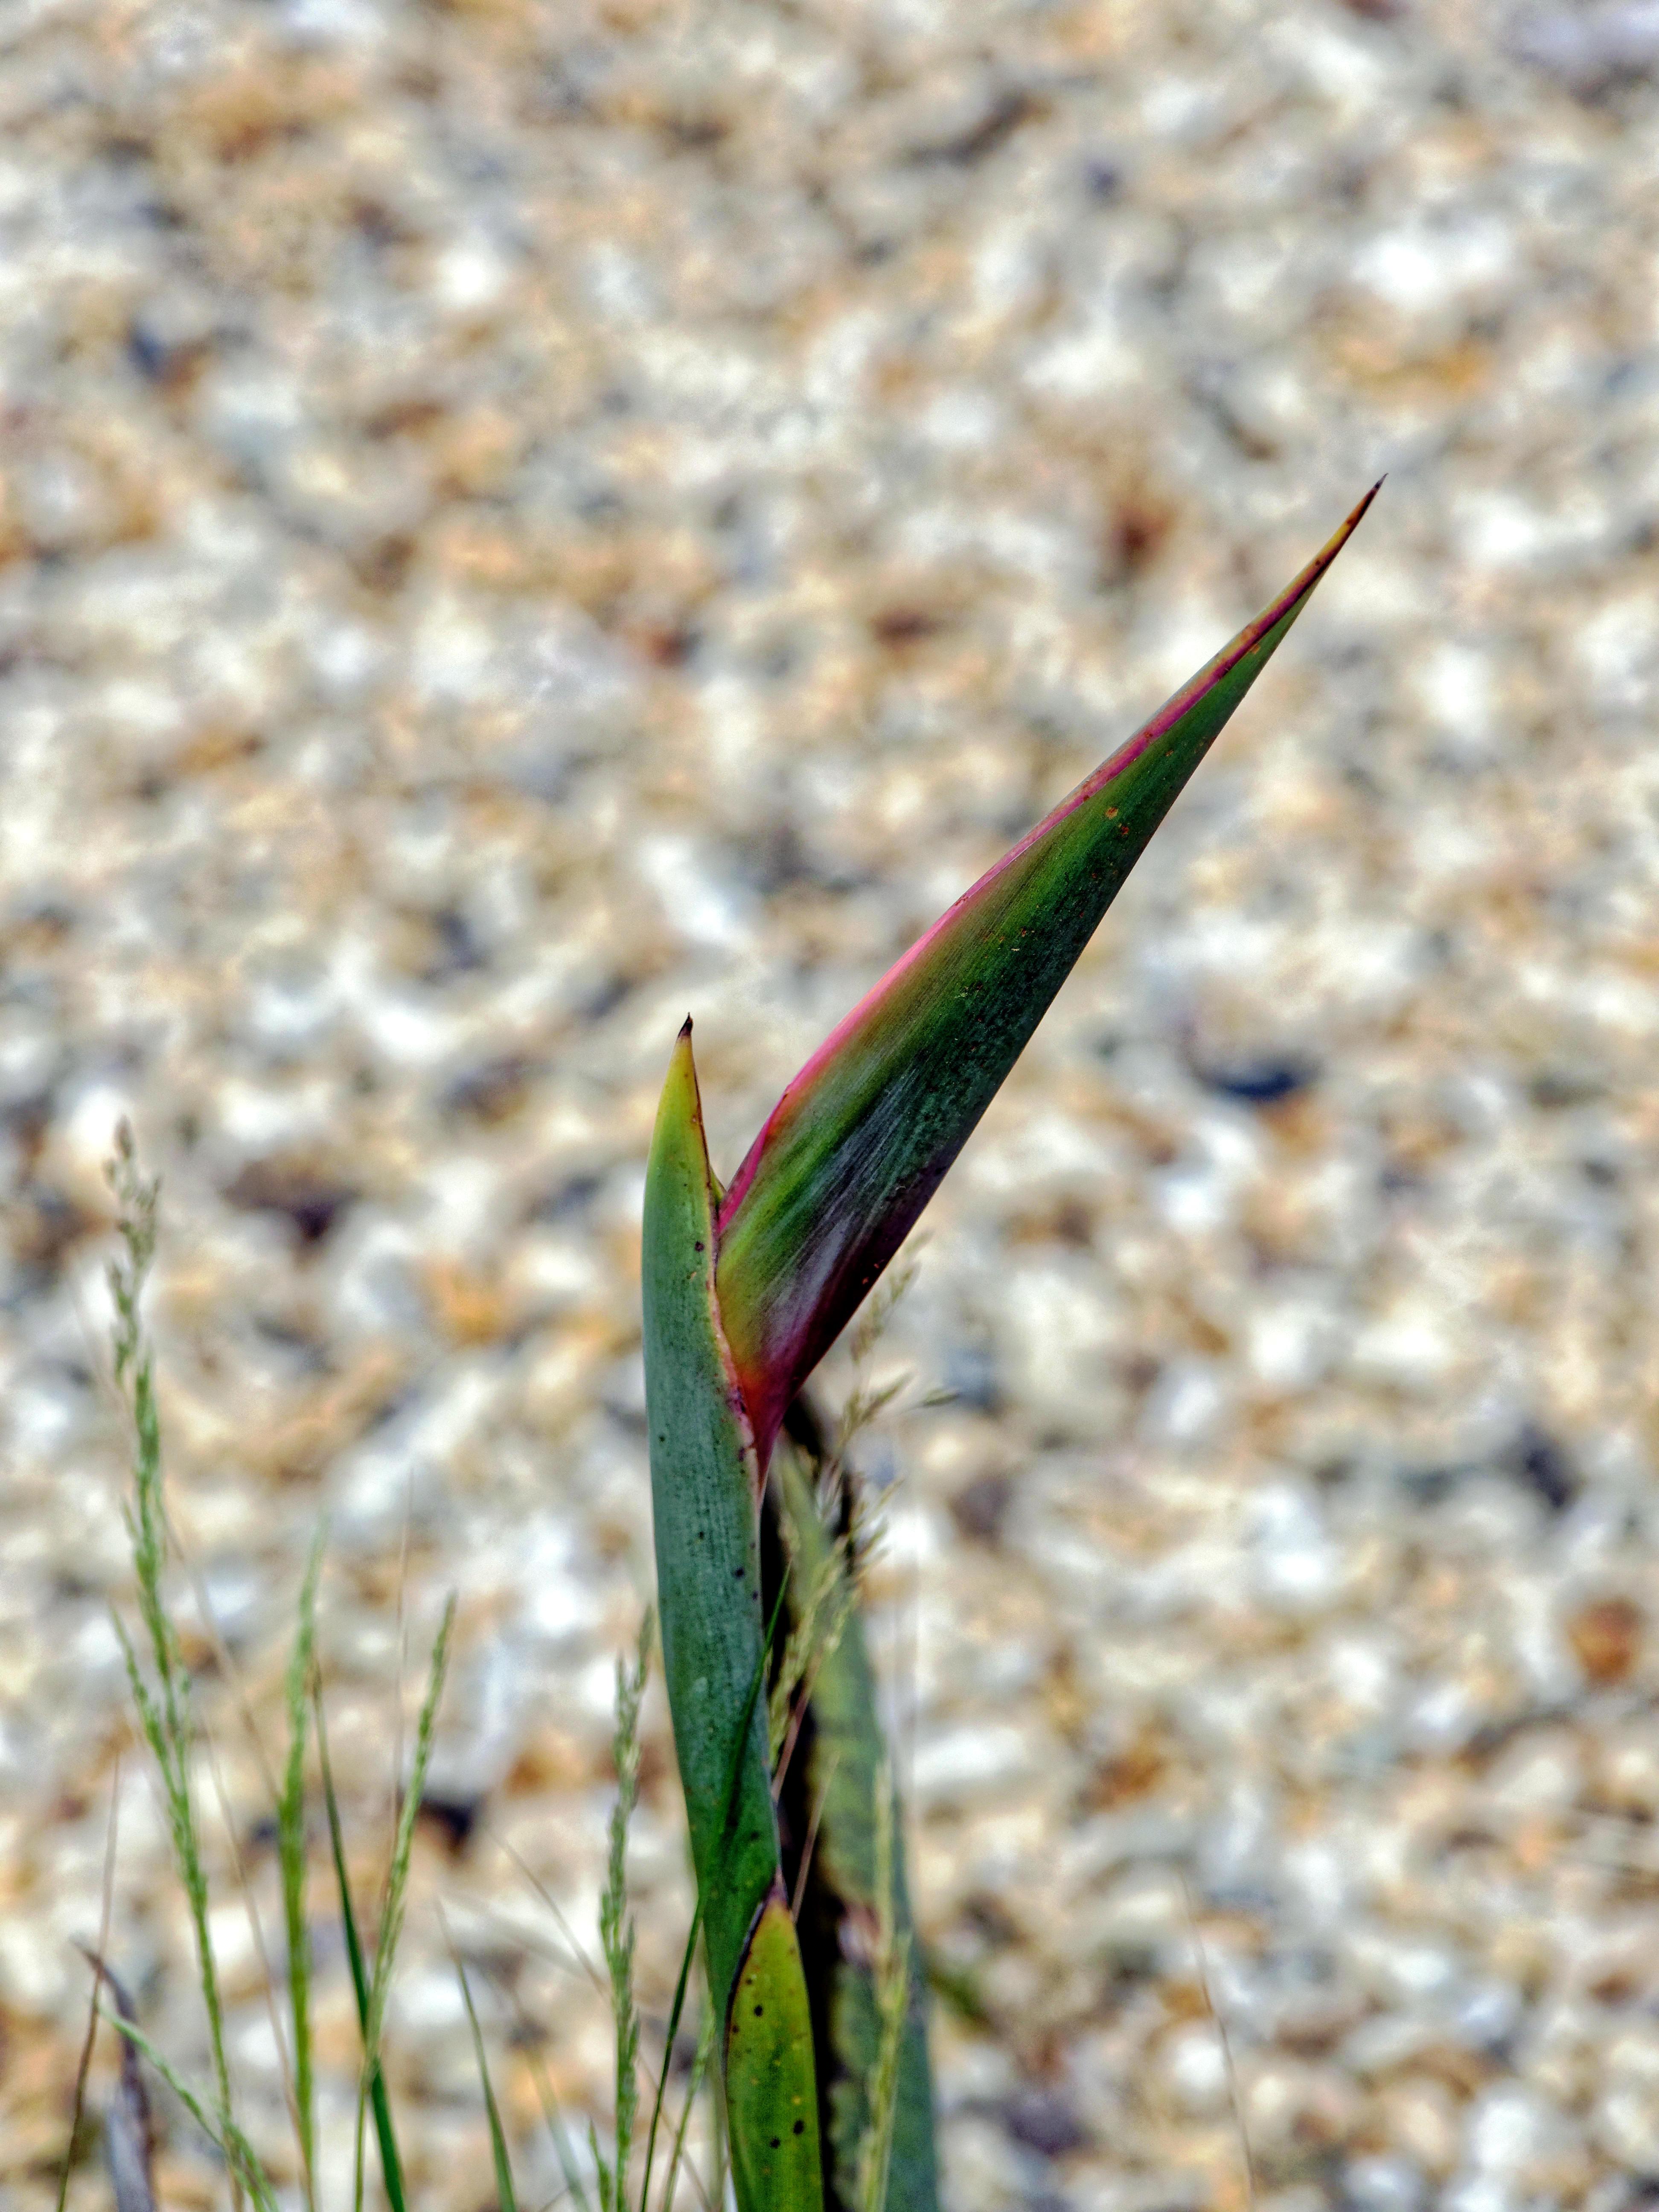 This should be Strelitzia-reginae.jpeg.  Is it missing?